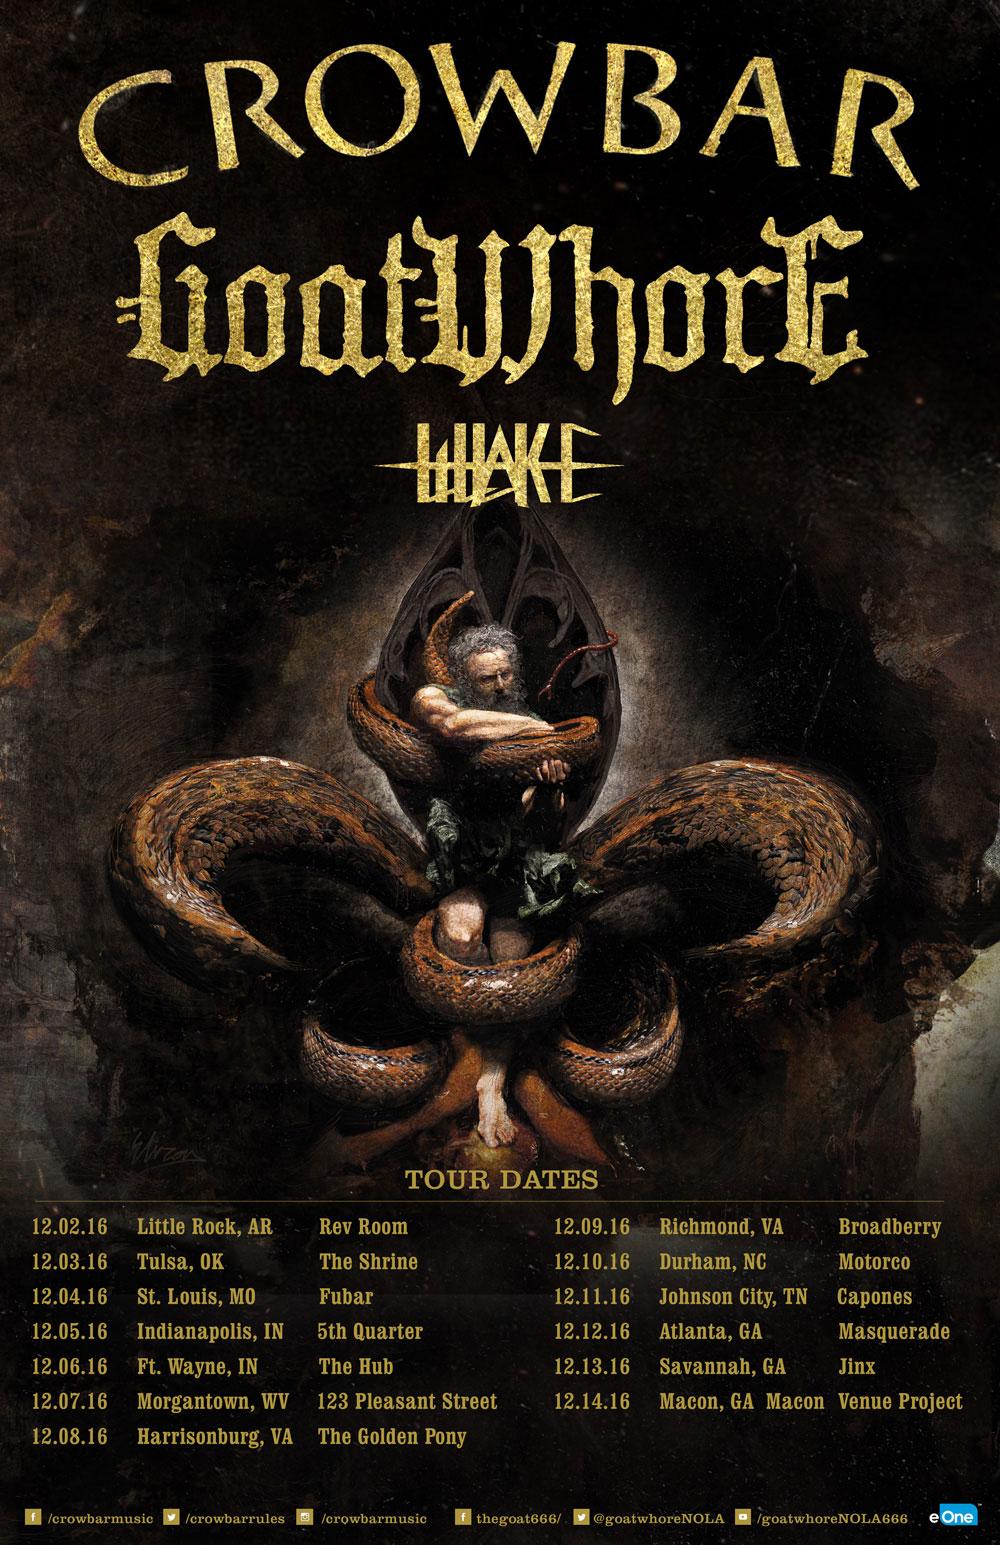 crowbar_goatwhore_tour2016